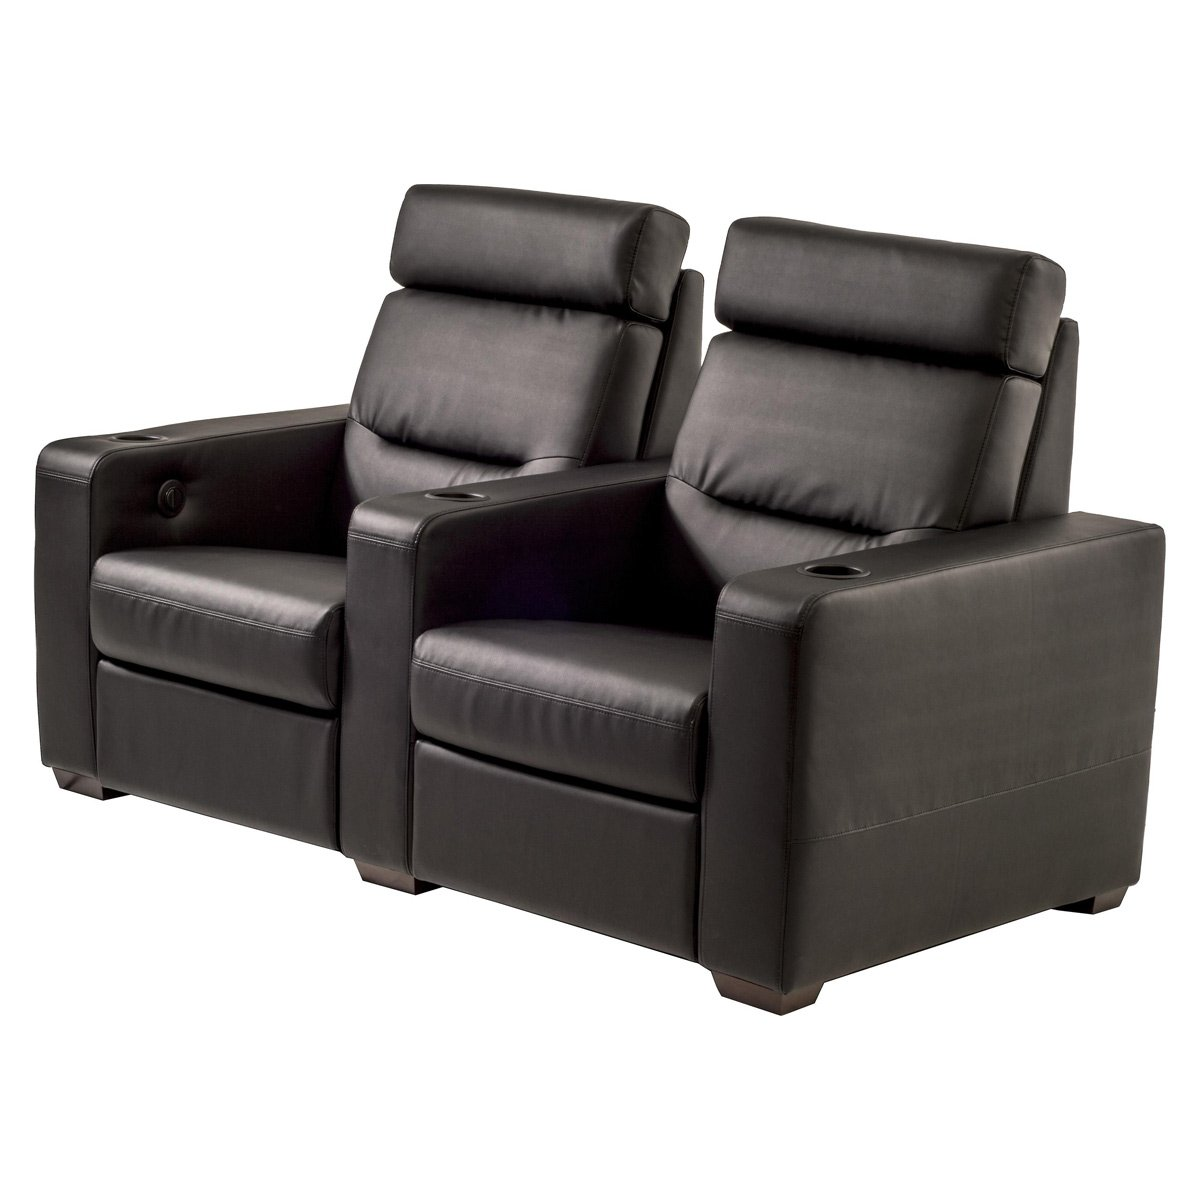 Salamander TC3 AV Basics 2-Seat Straight Motorized Recliner Home Theater Seating (Black Bonded Leather)